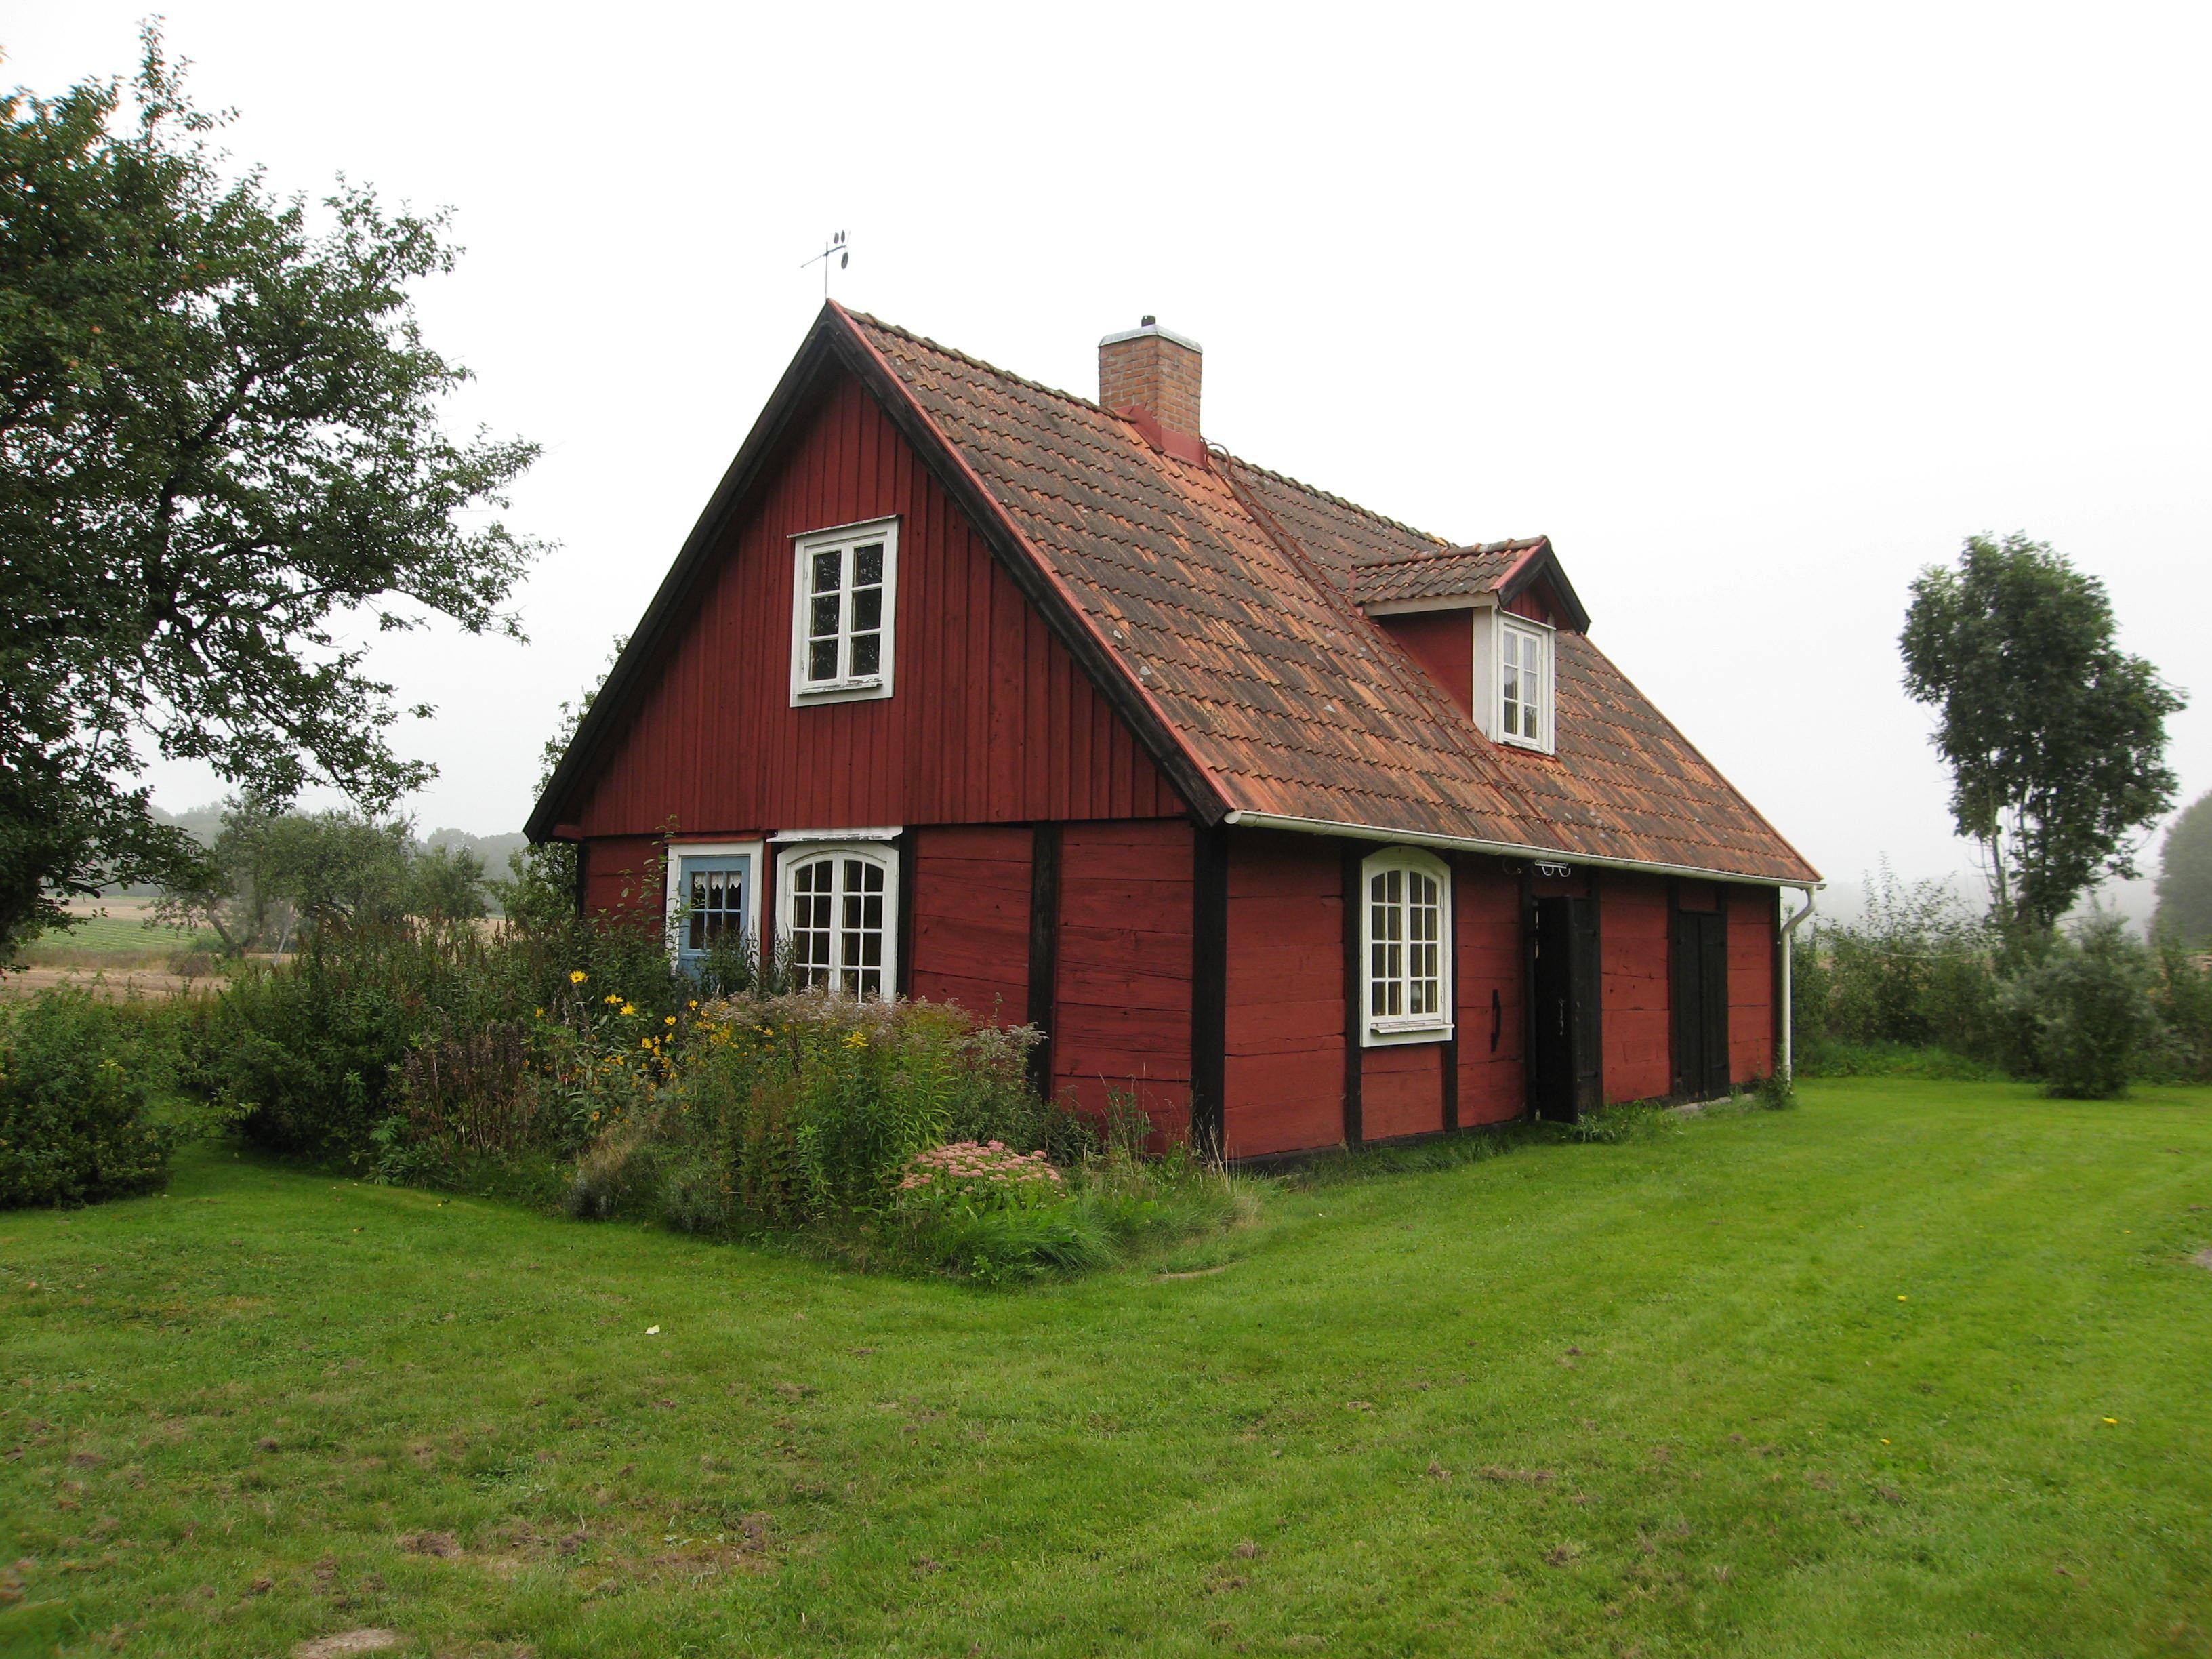 SK6004 Näsum, Olofström